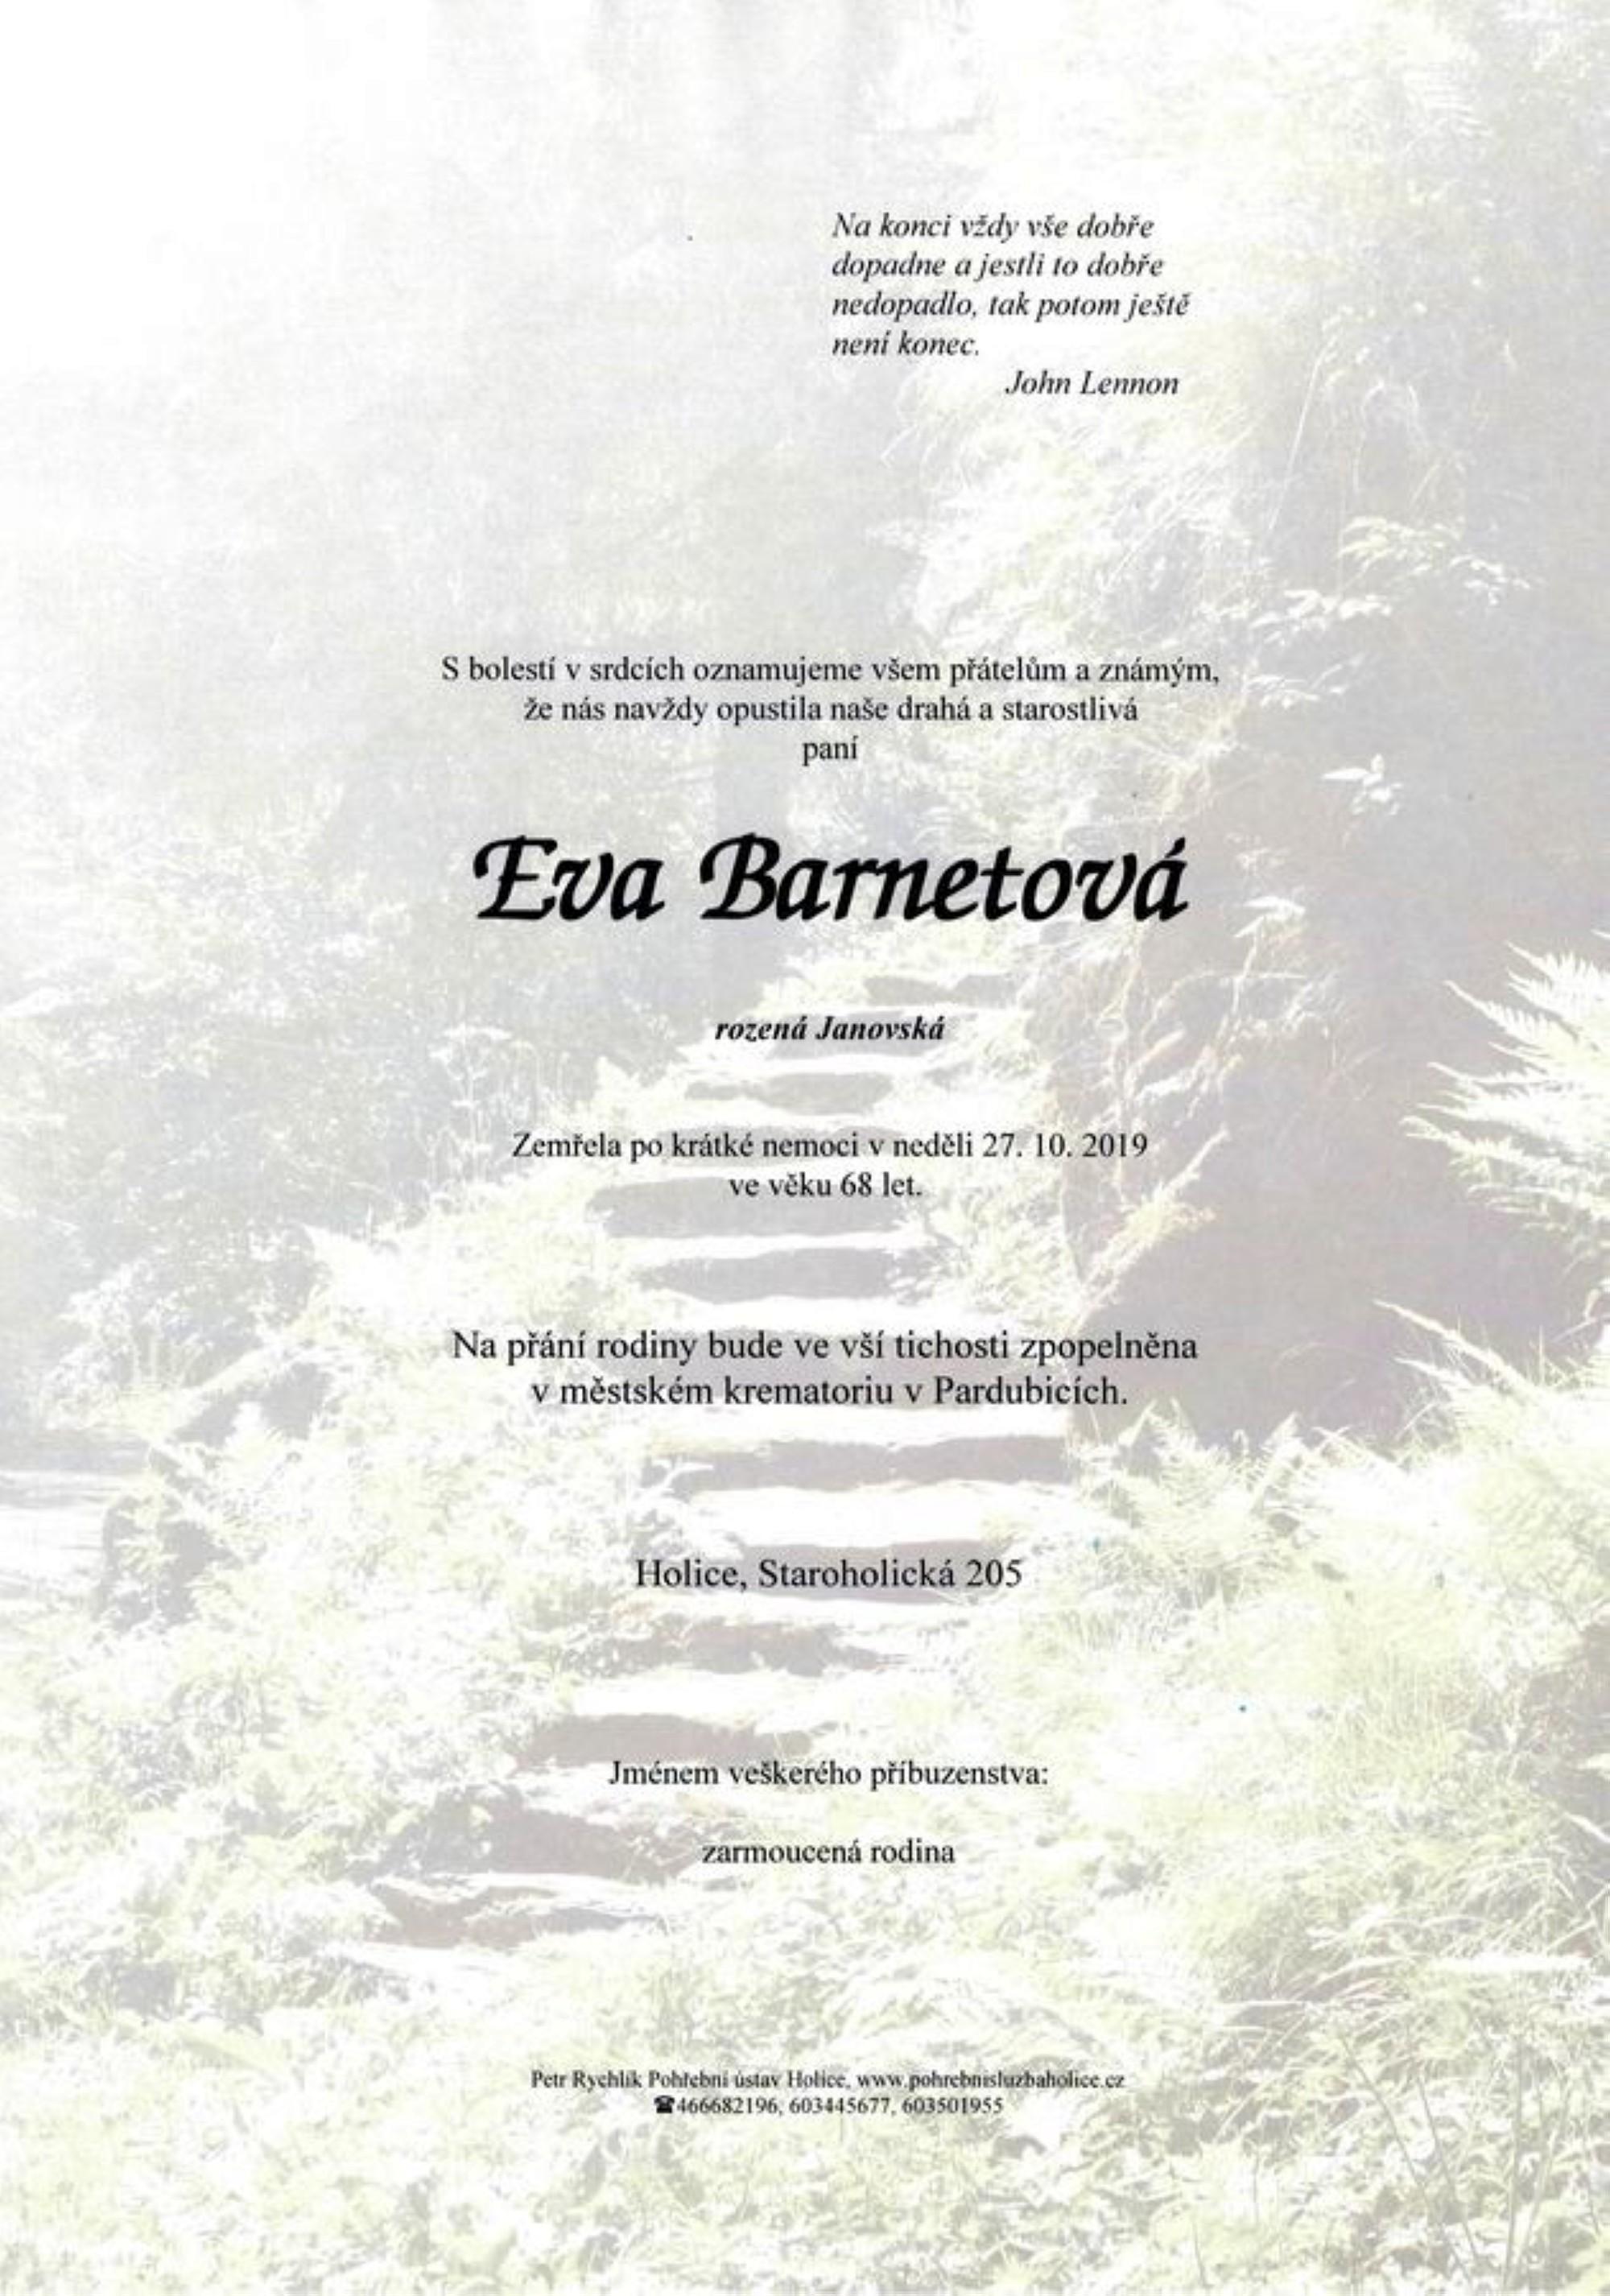 Eva Barnetová